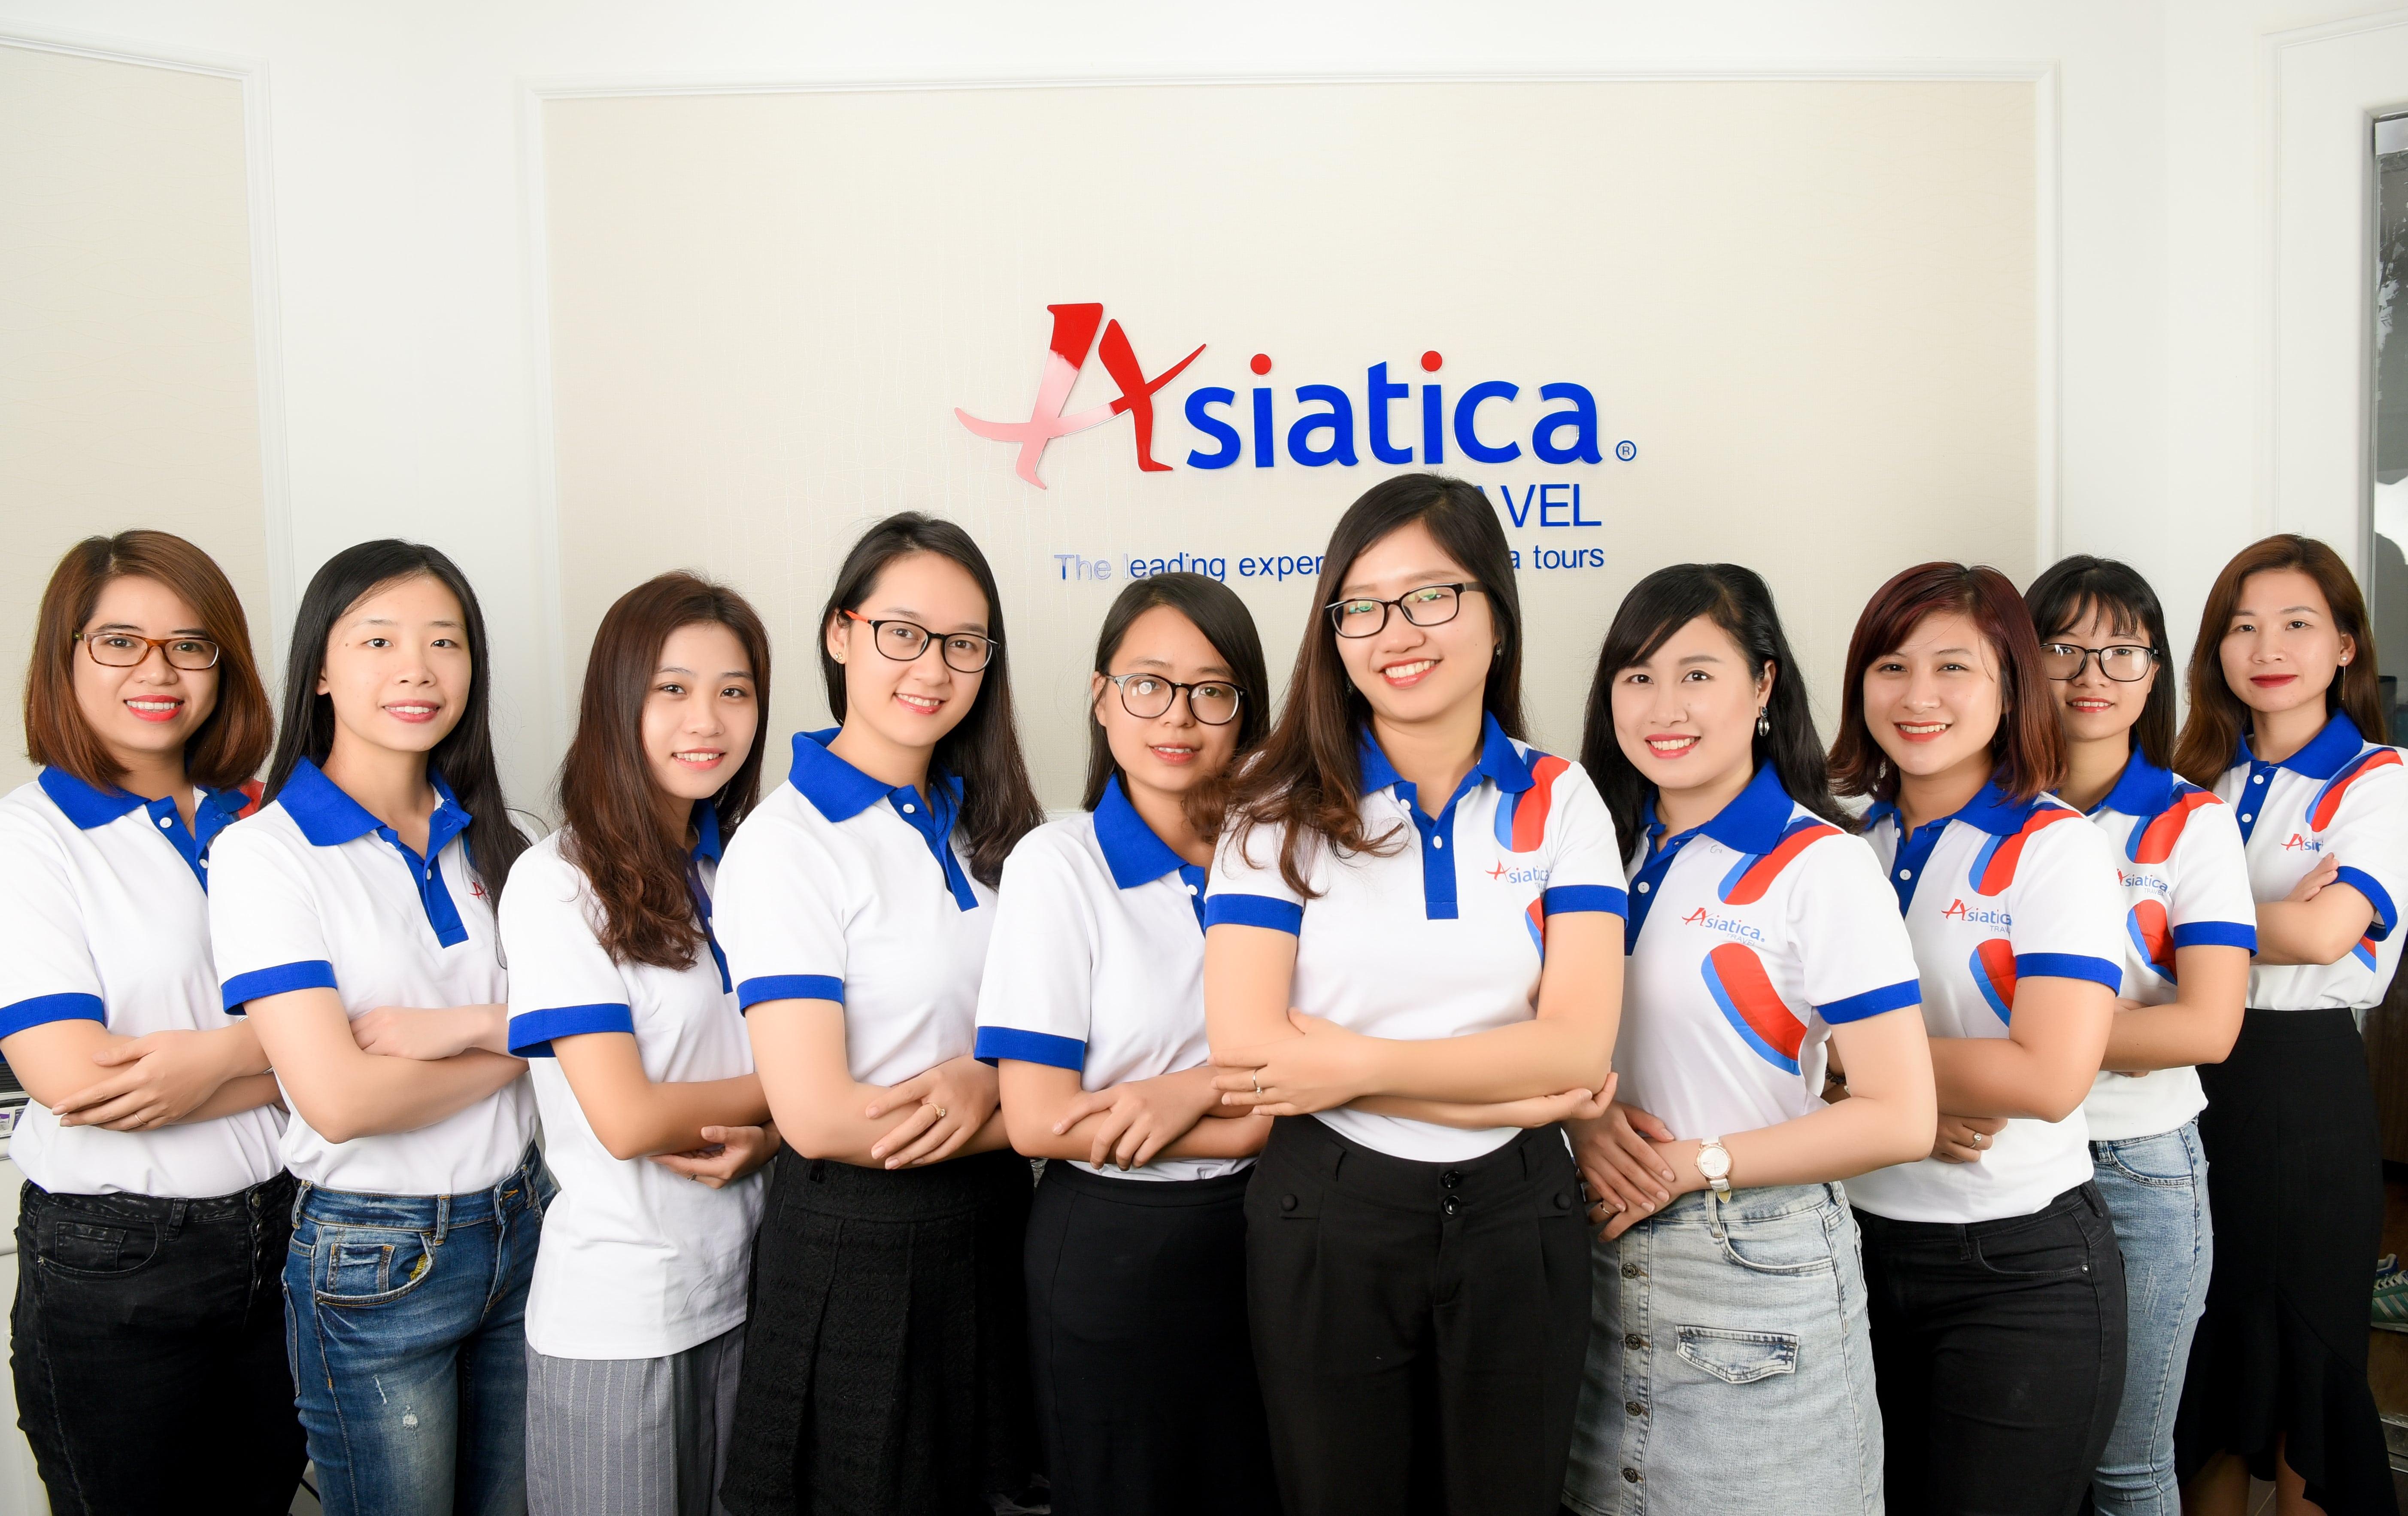 team Asiatica